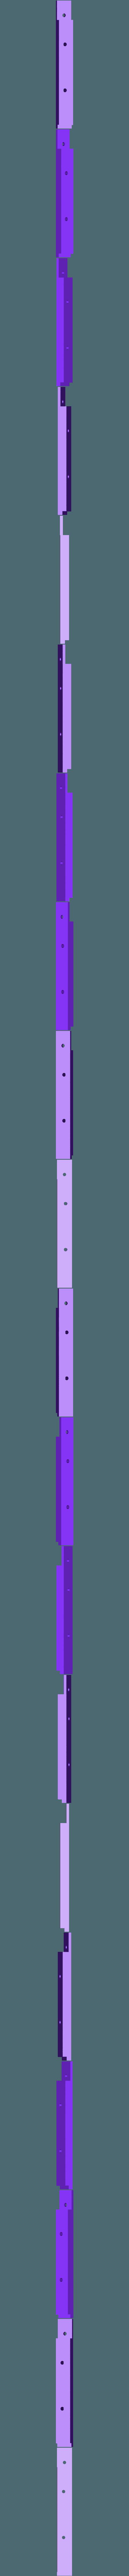 side_RT_upright_frame.stl Télécharger fichier STL gratuit Ghostbuster Ghostbuster Ghosttrap • Modèle pour impression 3D, SLIDES